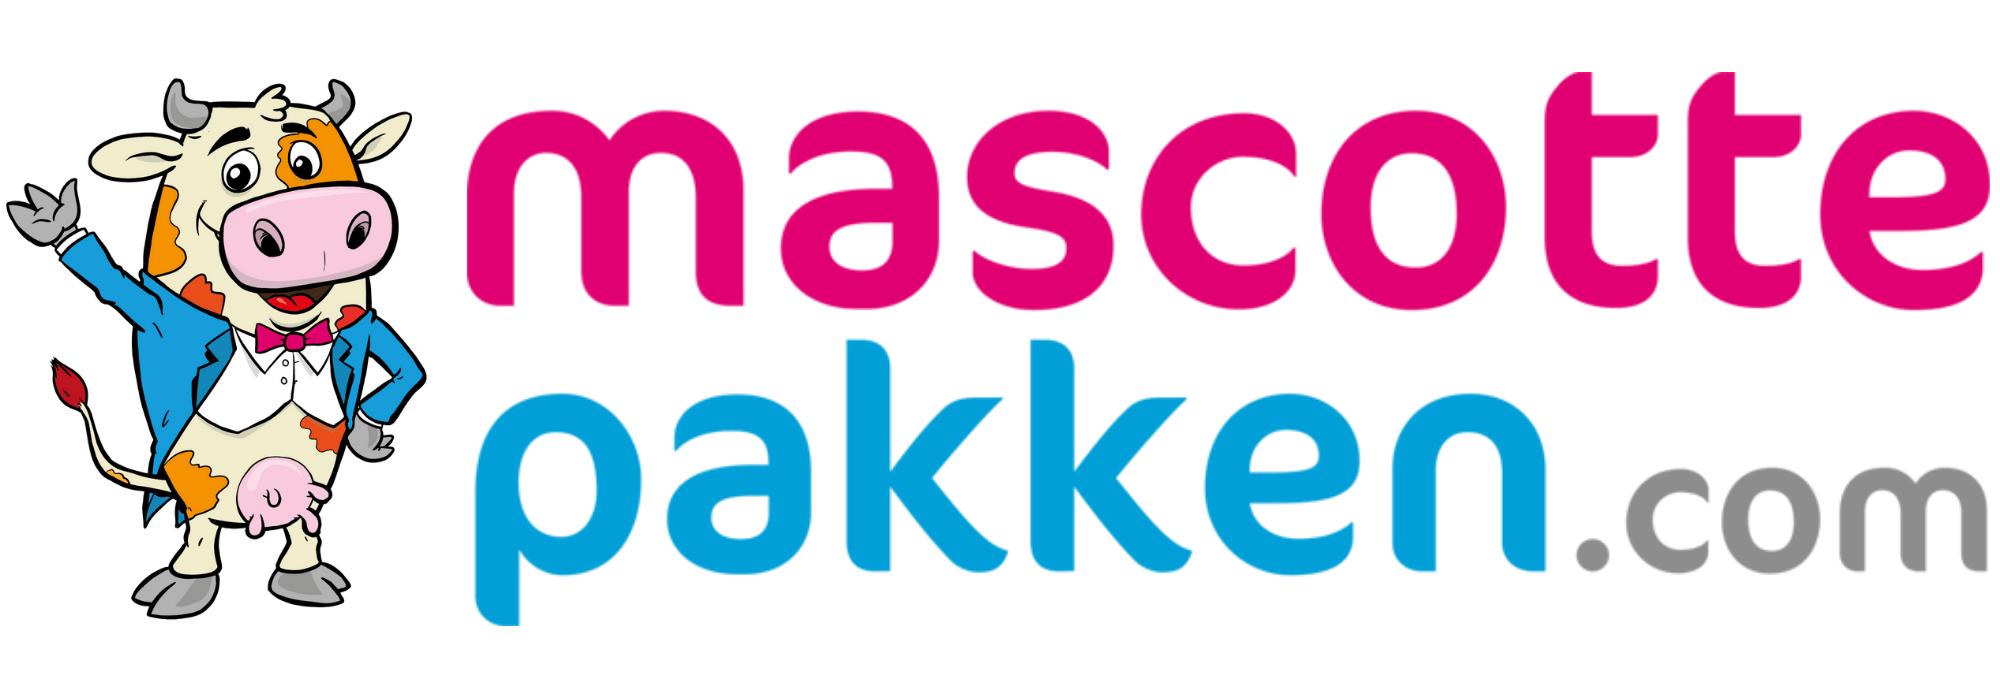 Mascottepakken.com